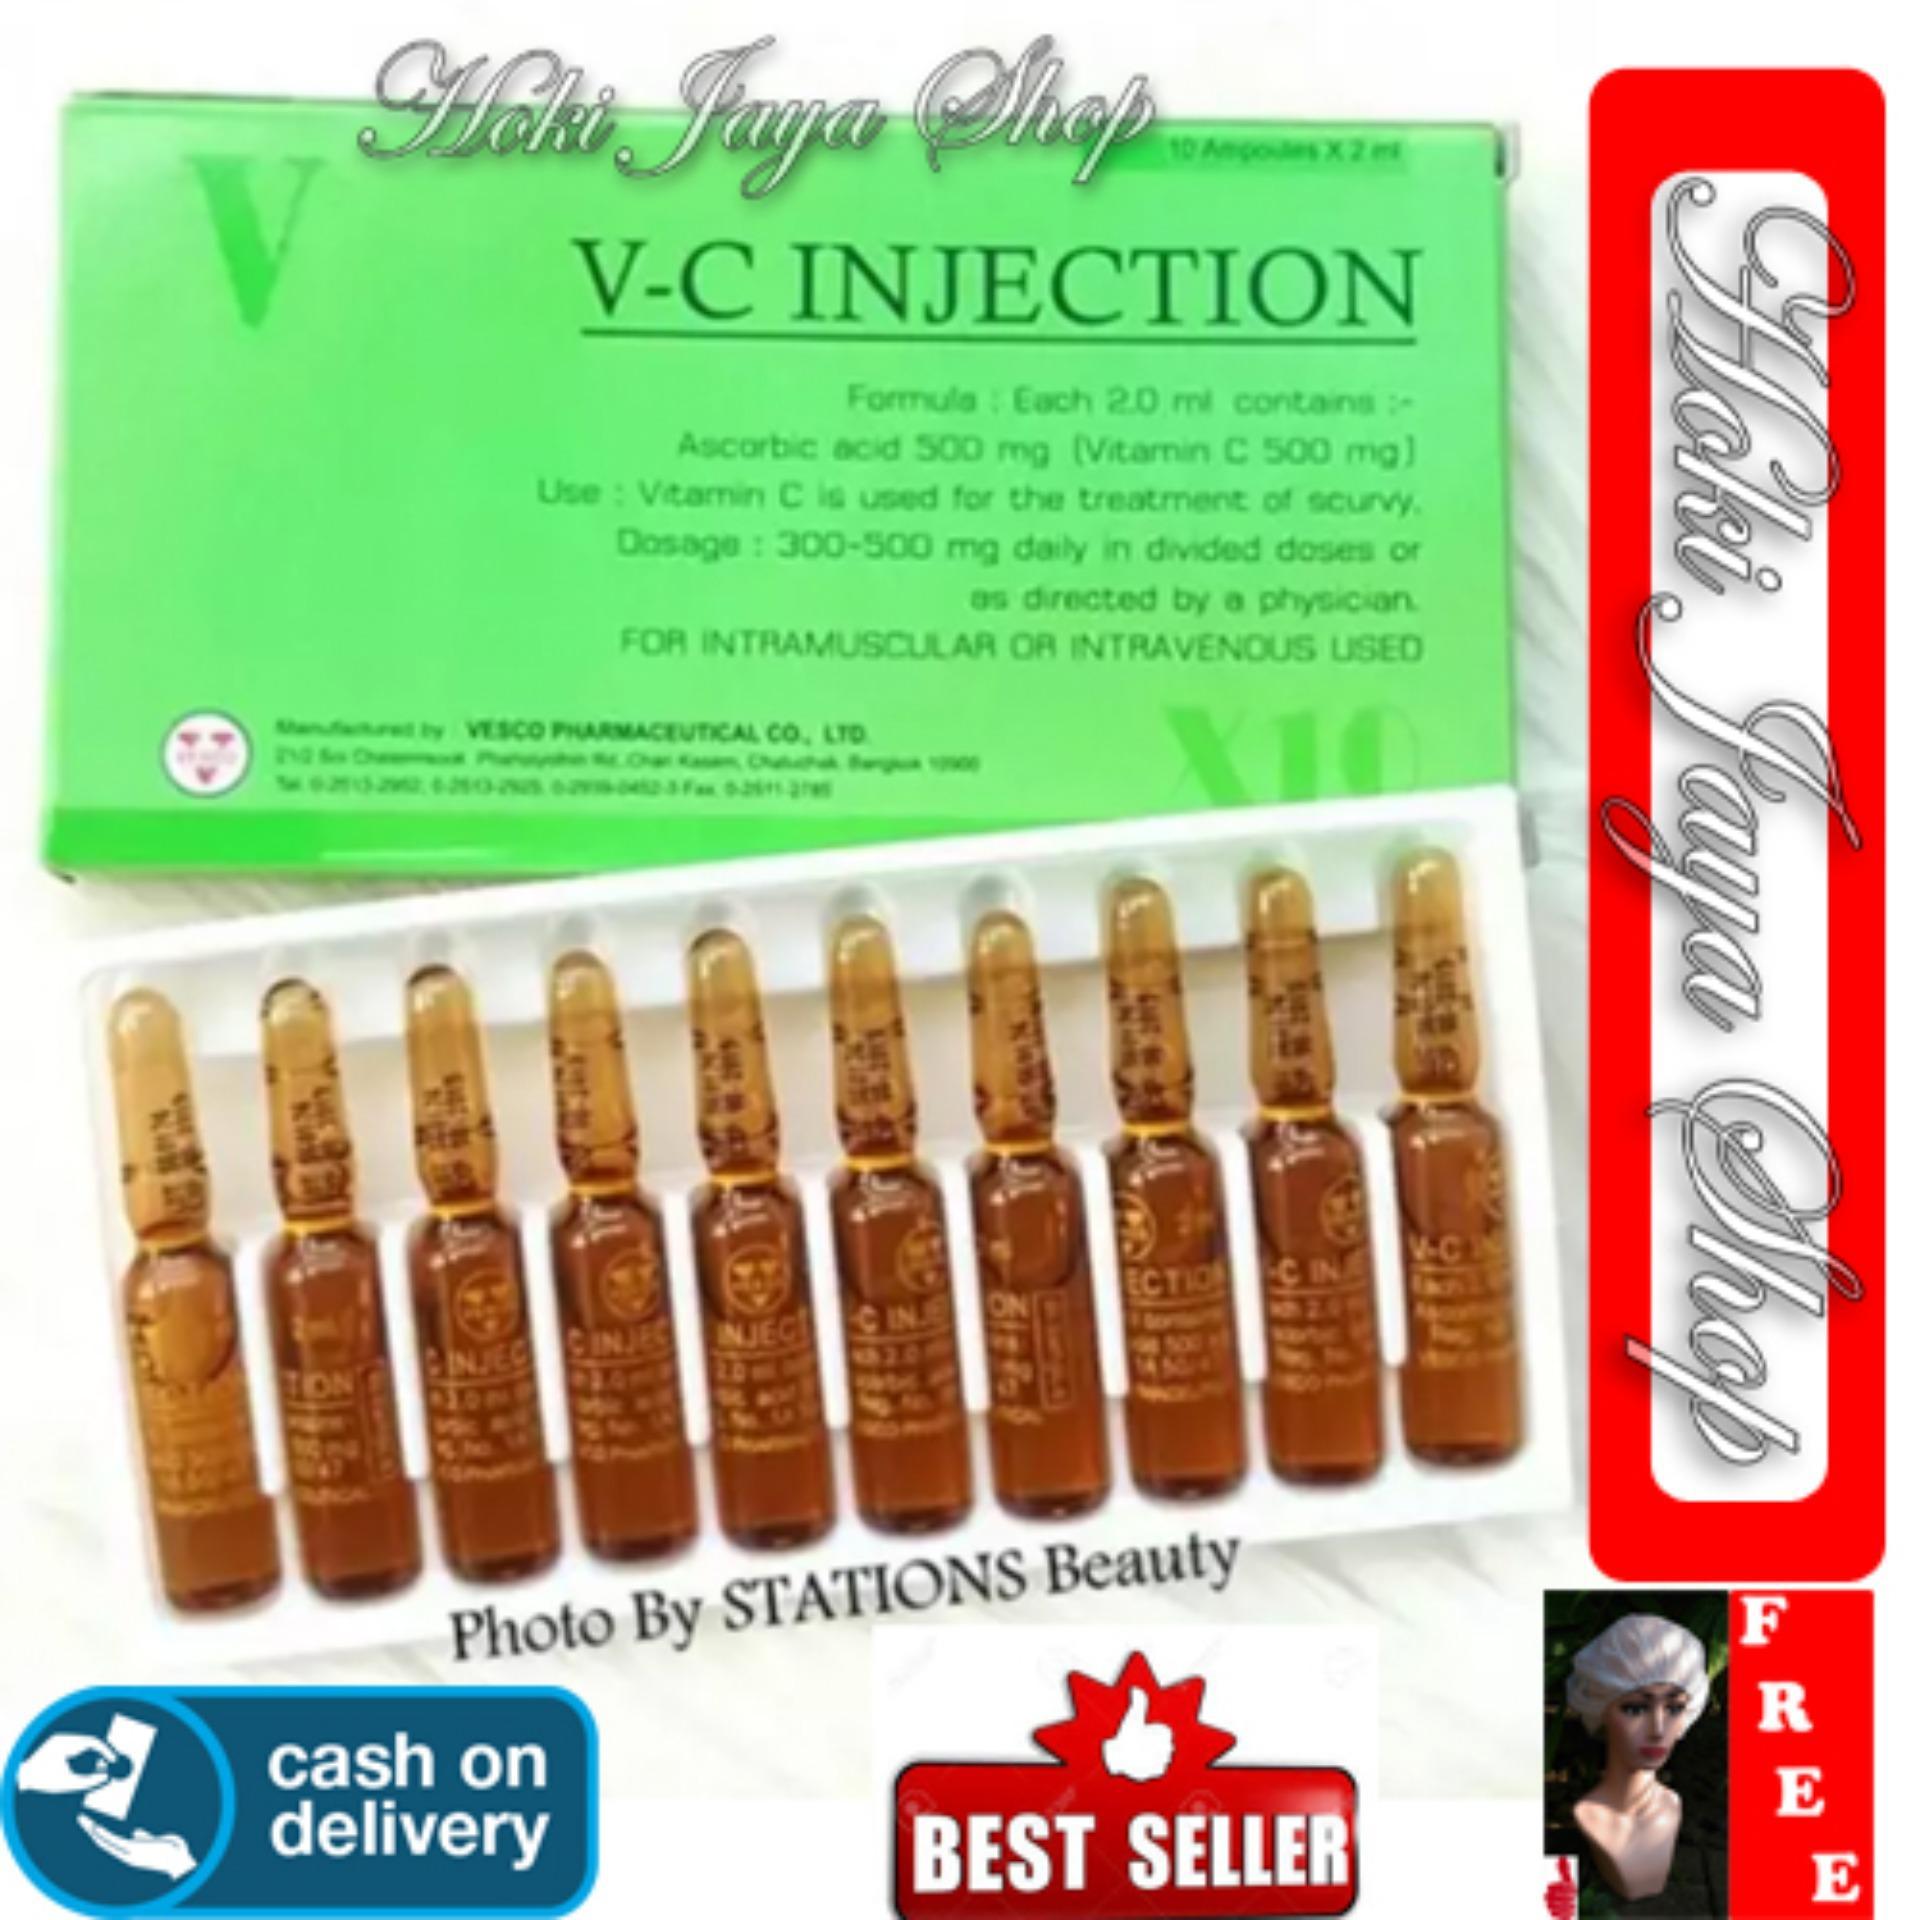 HOKI COD - VC Injection 1 Box Isi 10 Ampul - / Vitamin C Injection / VC Injeksi / Serum Vitamin C Ascorib Acid 100% Original Thailand - GM 1 + Shower Cap Putih - Premium